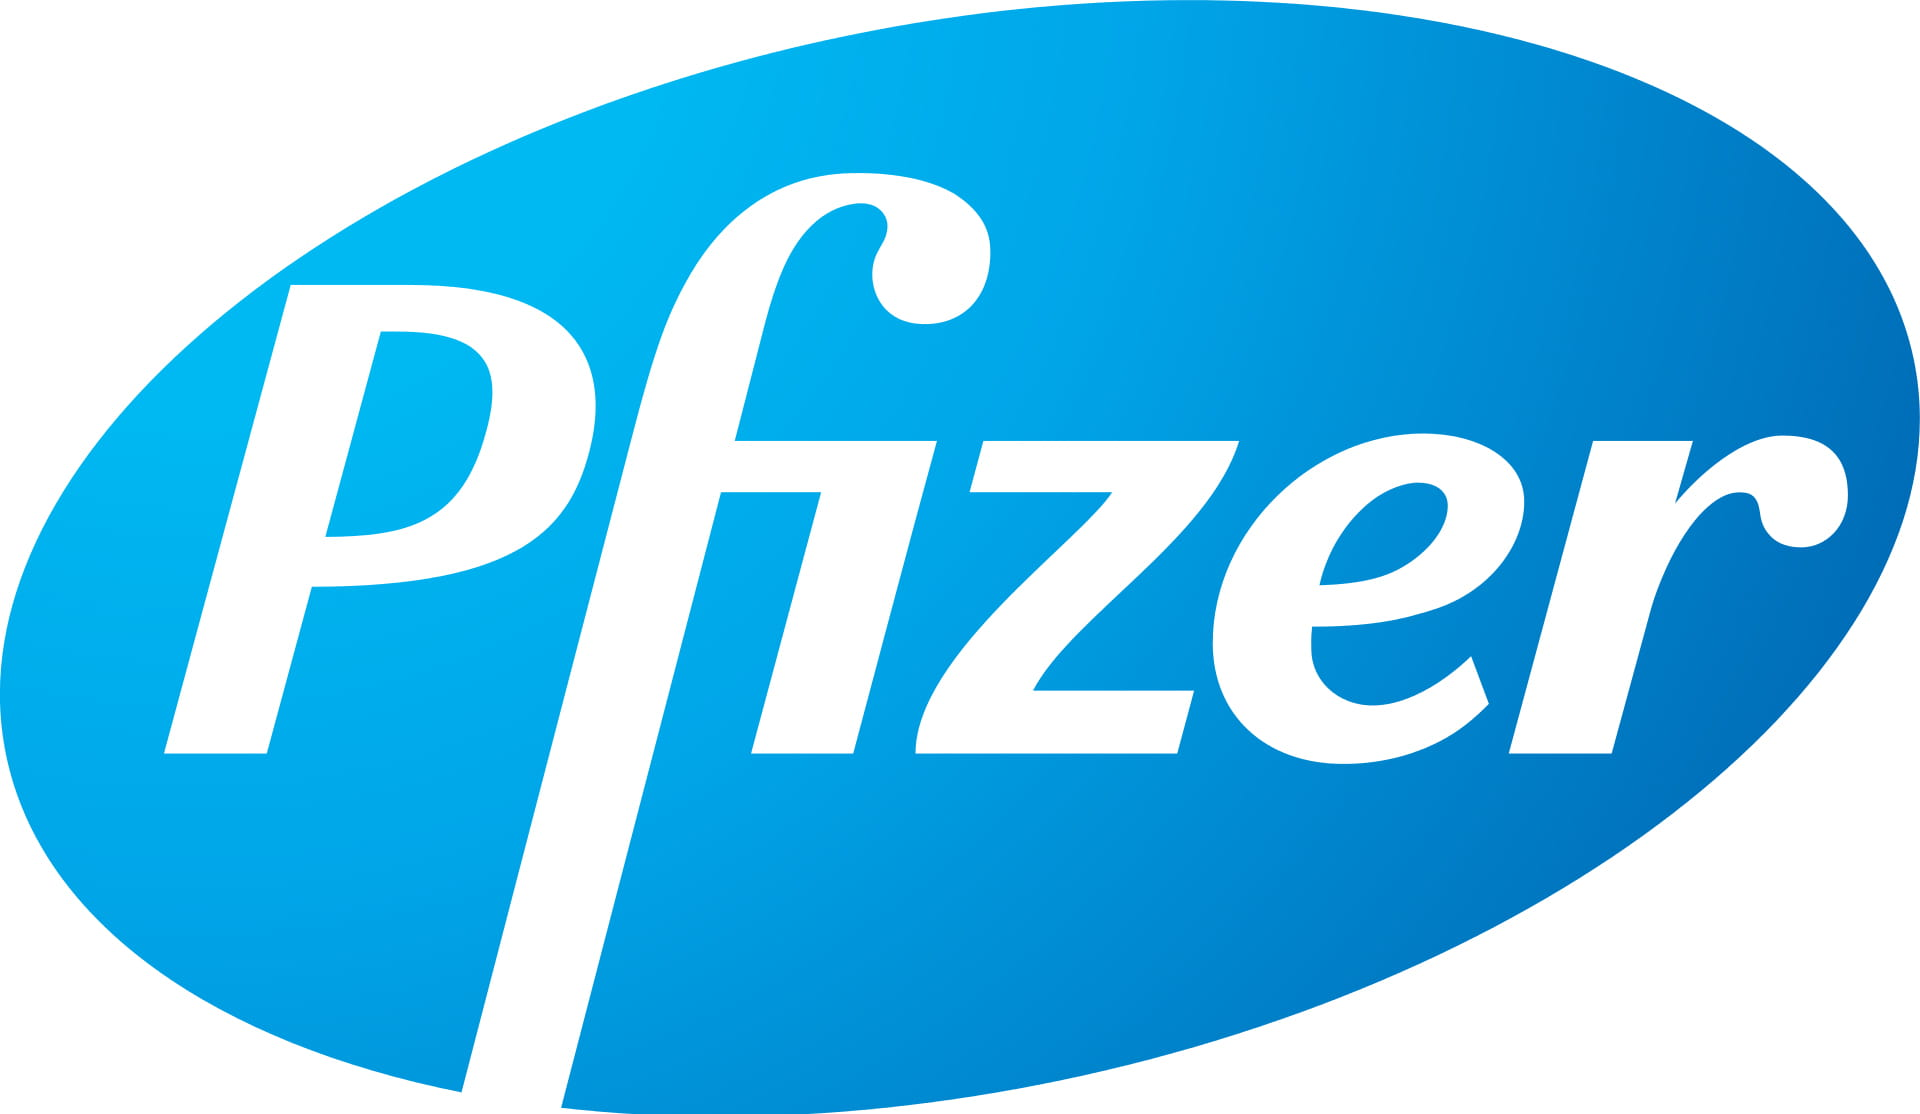 Pfizer Consumer Healthcare GmbH